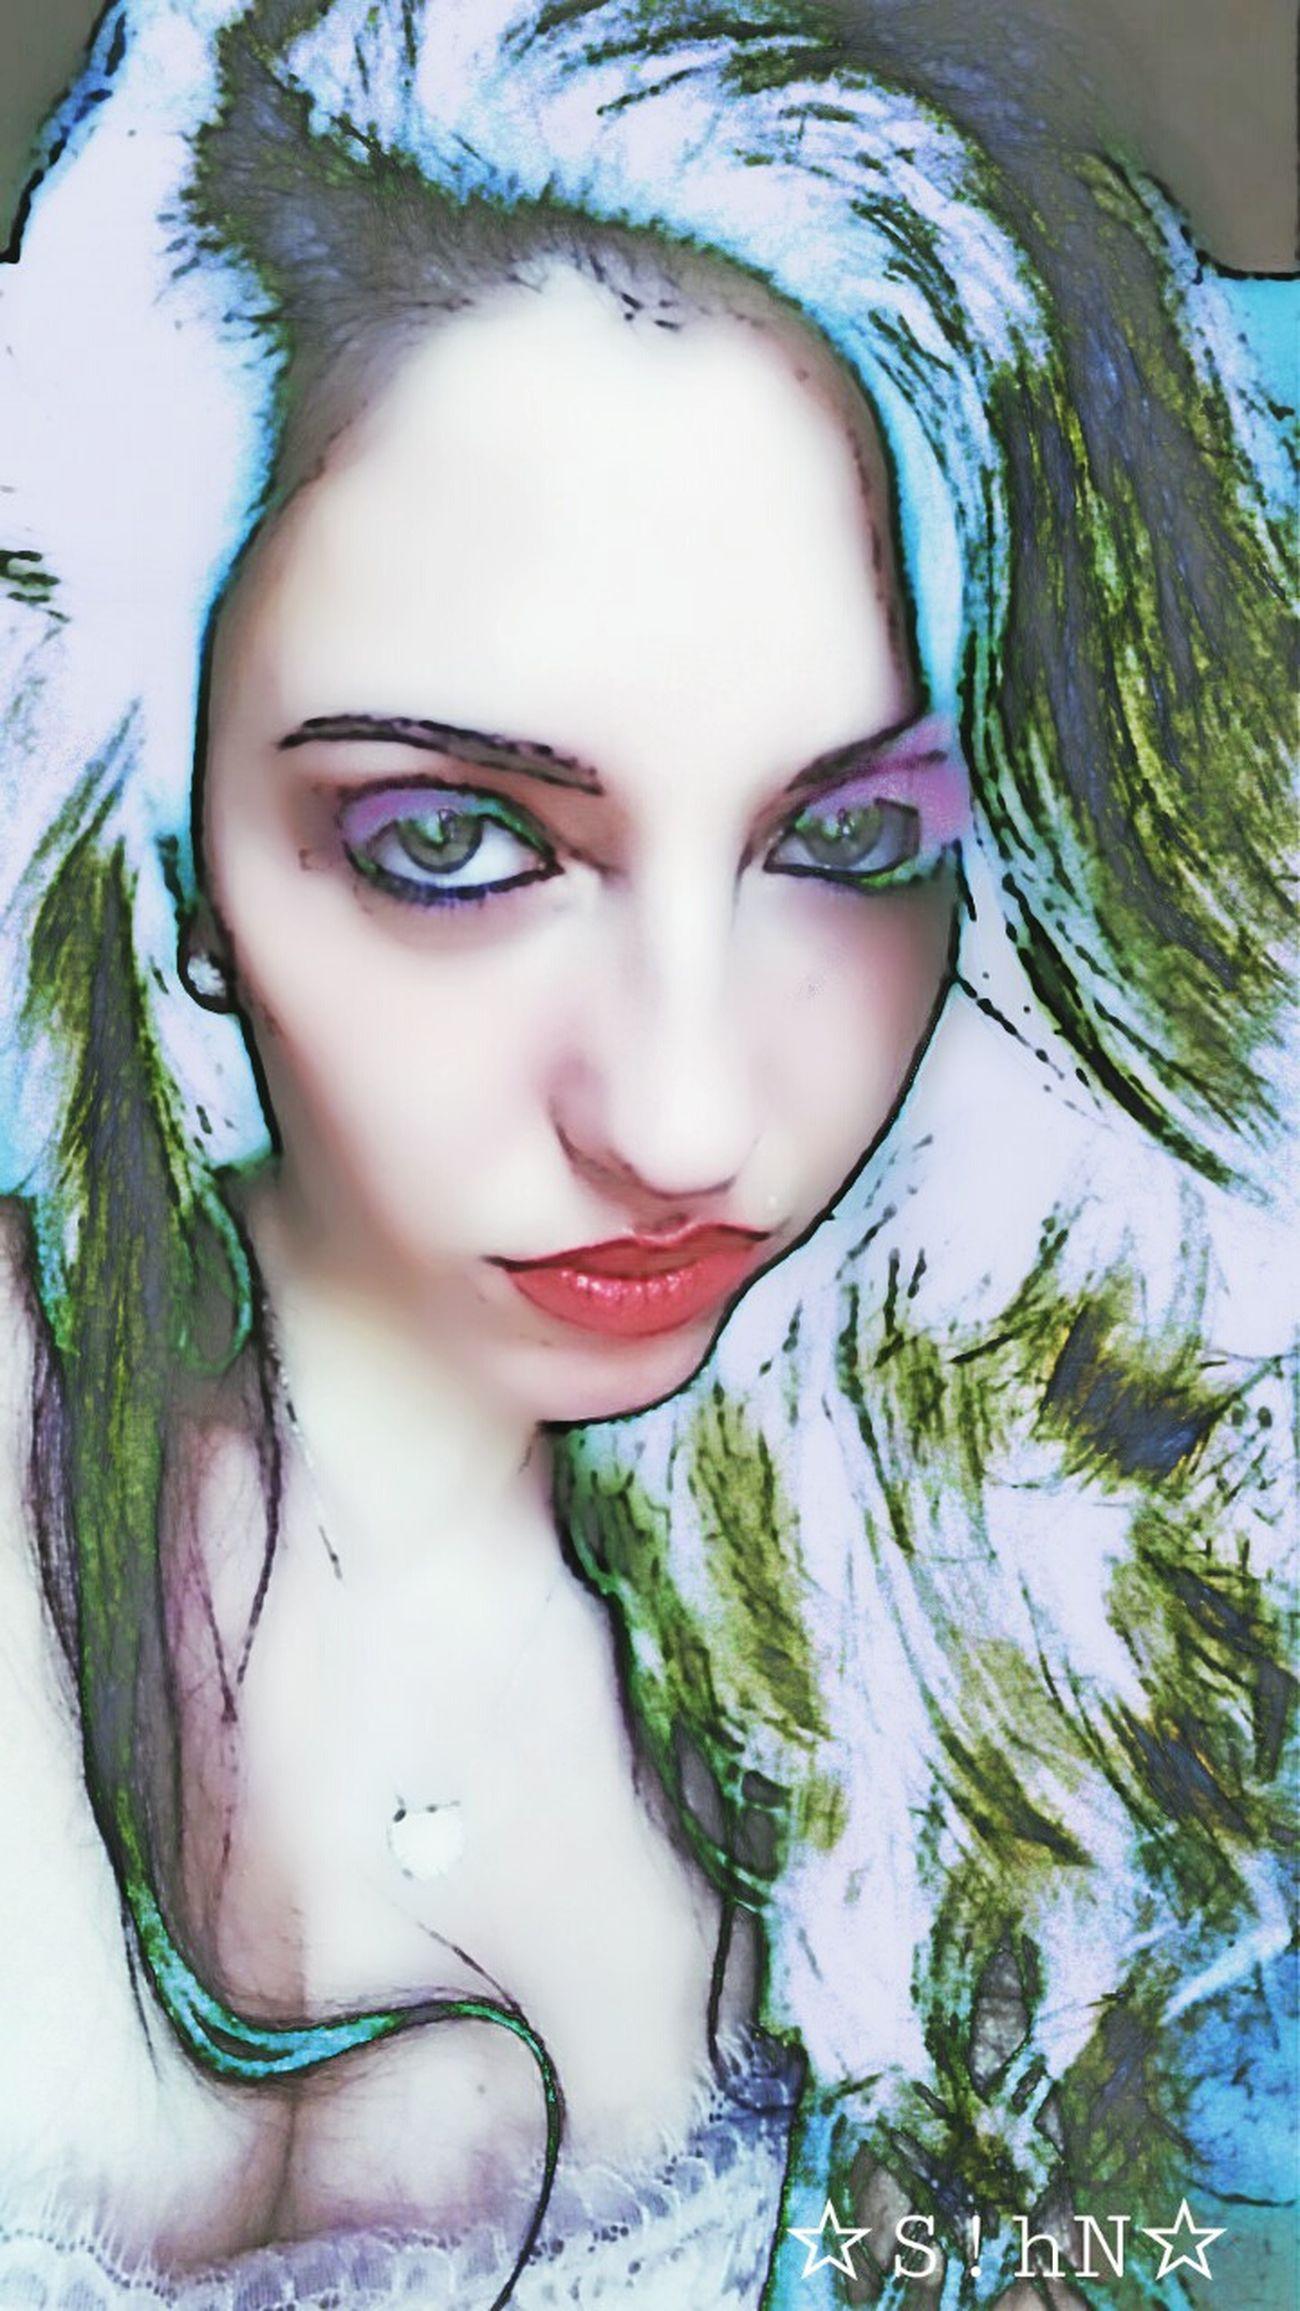 Freetoedit Artisticselfie Drawstepbystep Drawings Art, Drawing, Creativity Texture My Photography